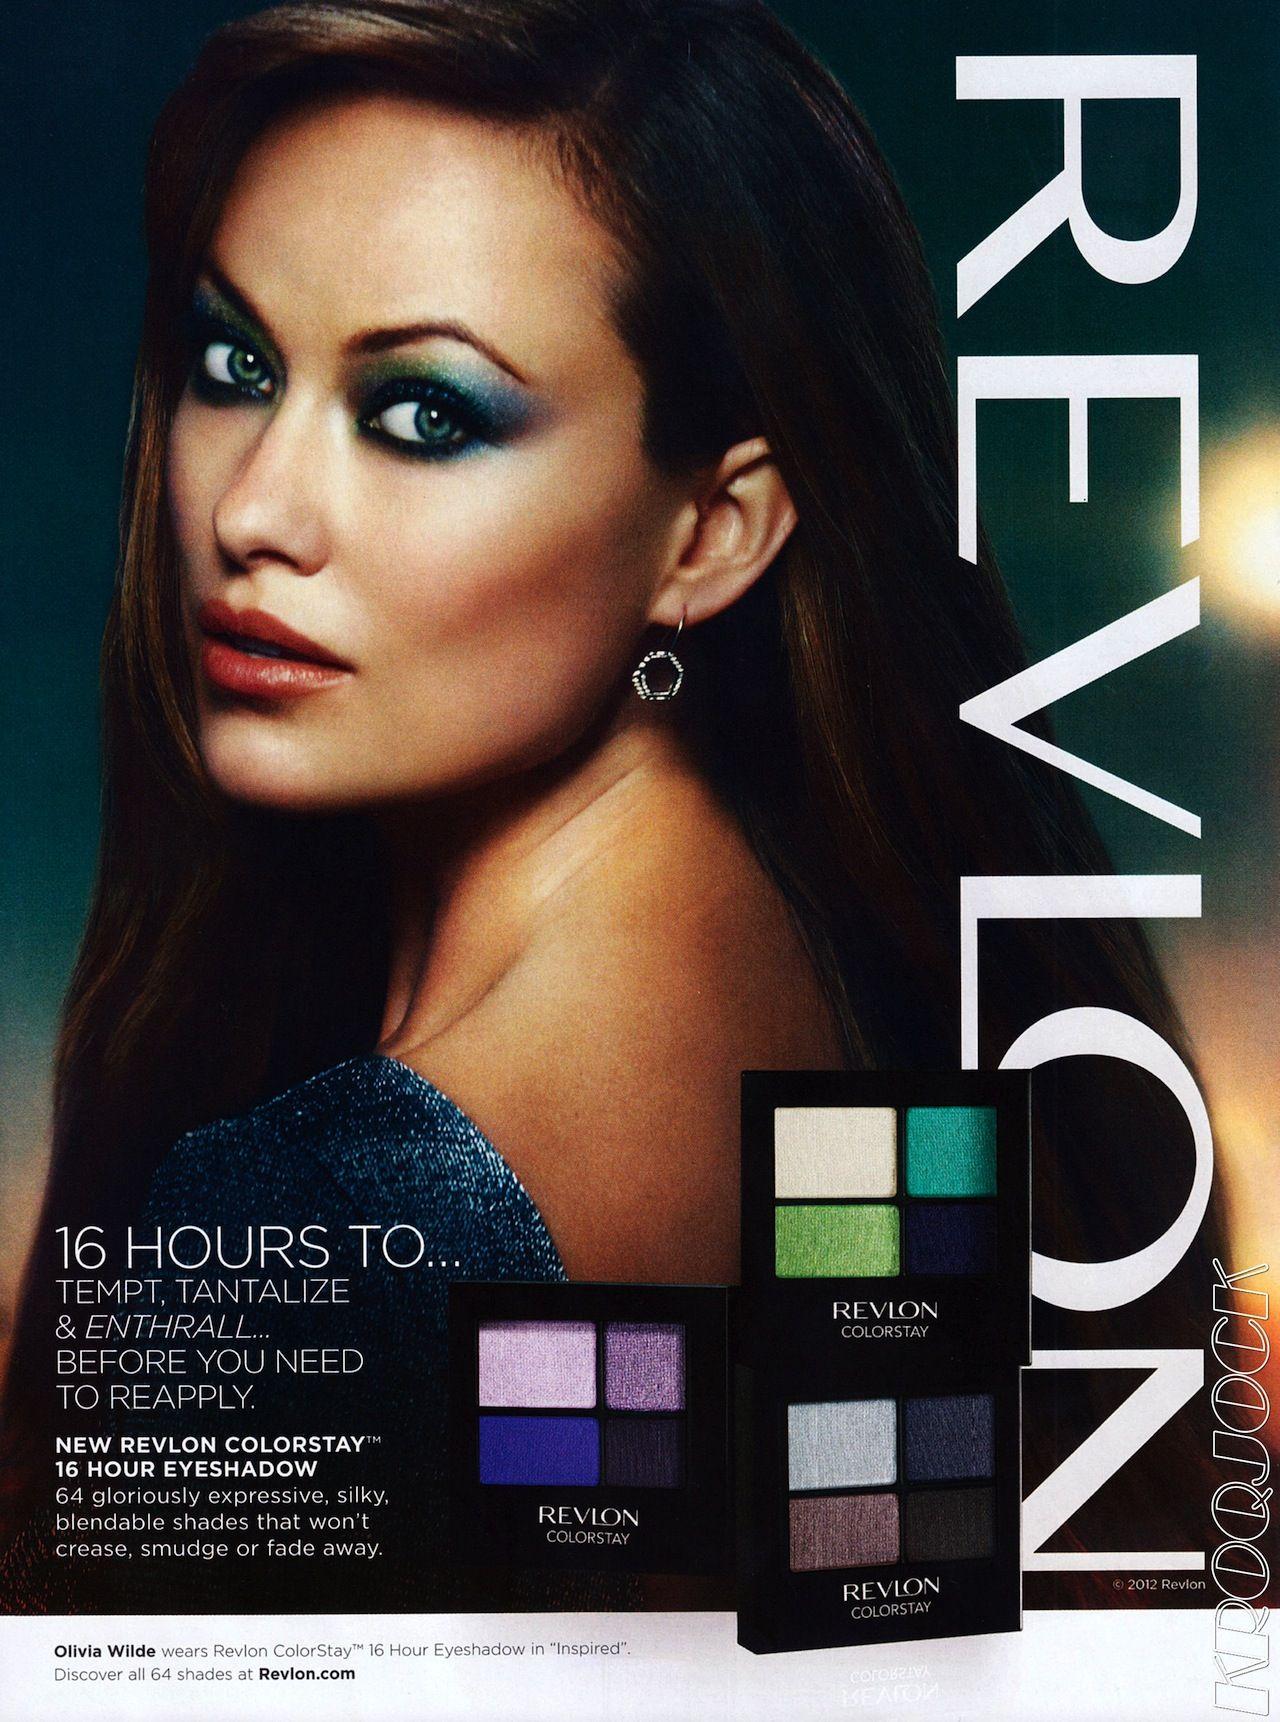 Revlon Spring Summer 2012 Ad Campaign | Art8amby's Blog